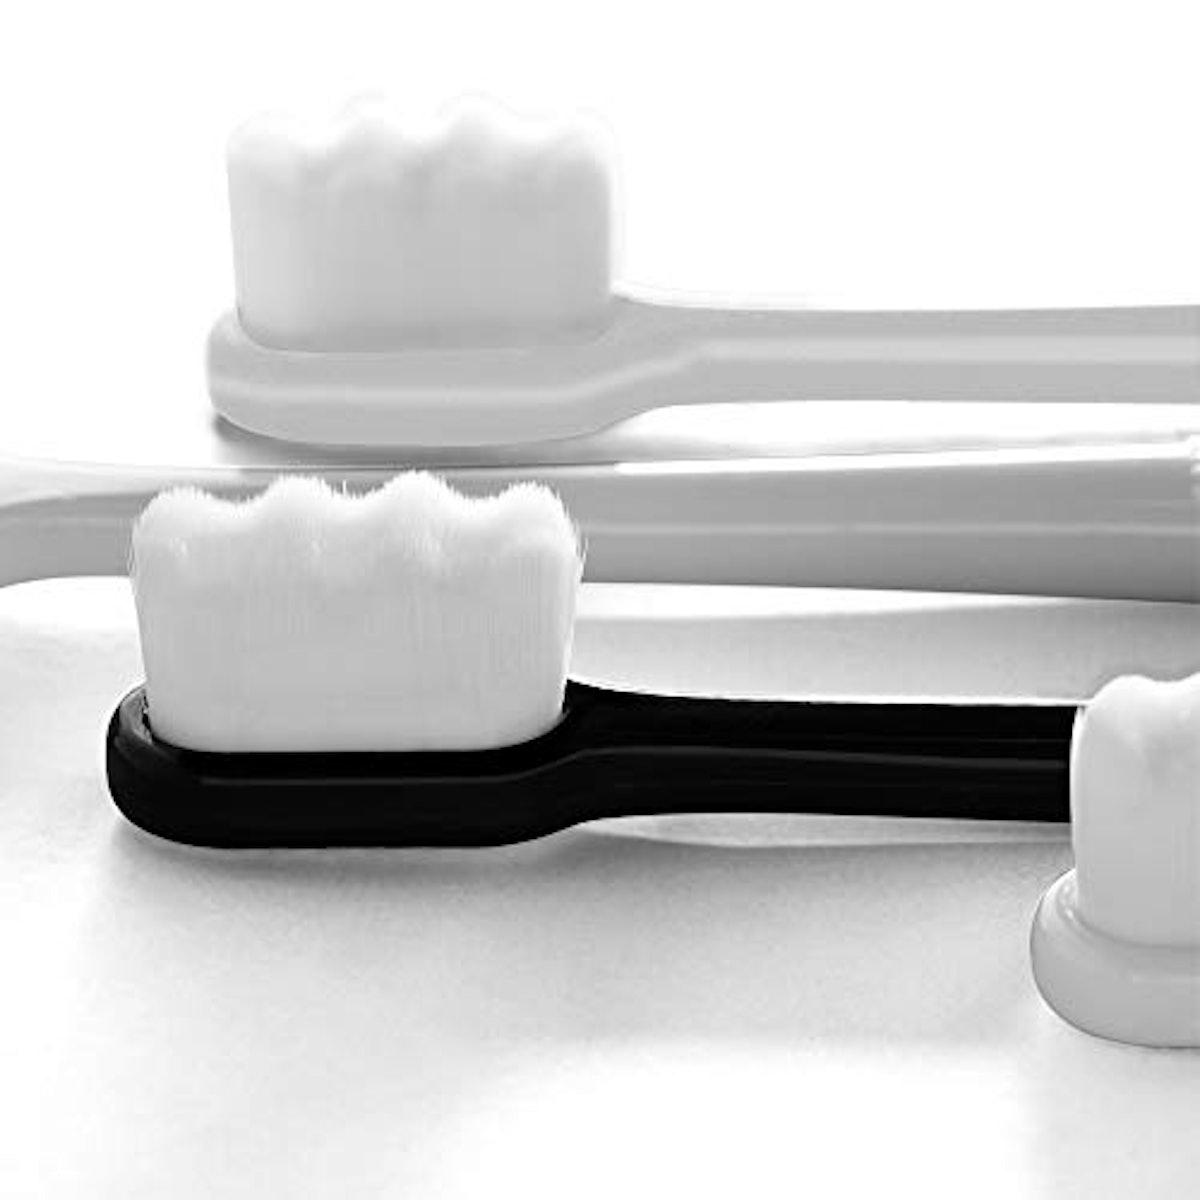 Di Qiu Ren Extra Soft Toothbrush - 2 Pcs